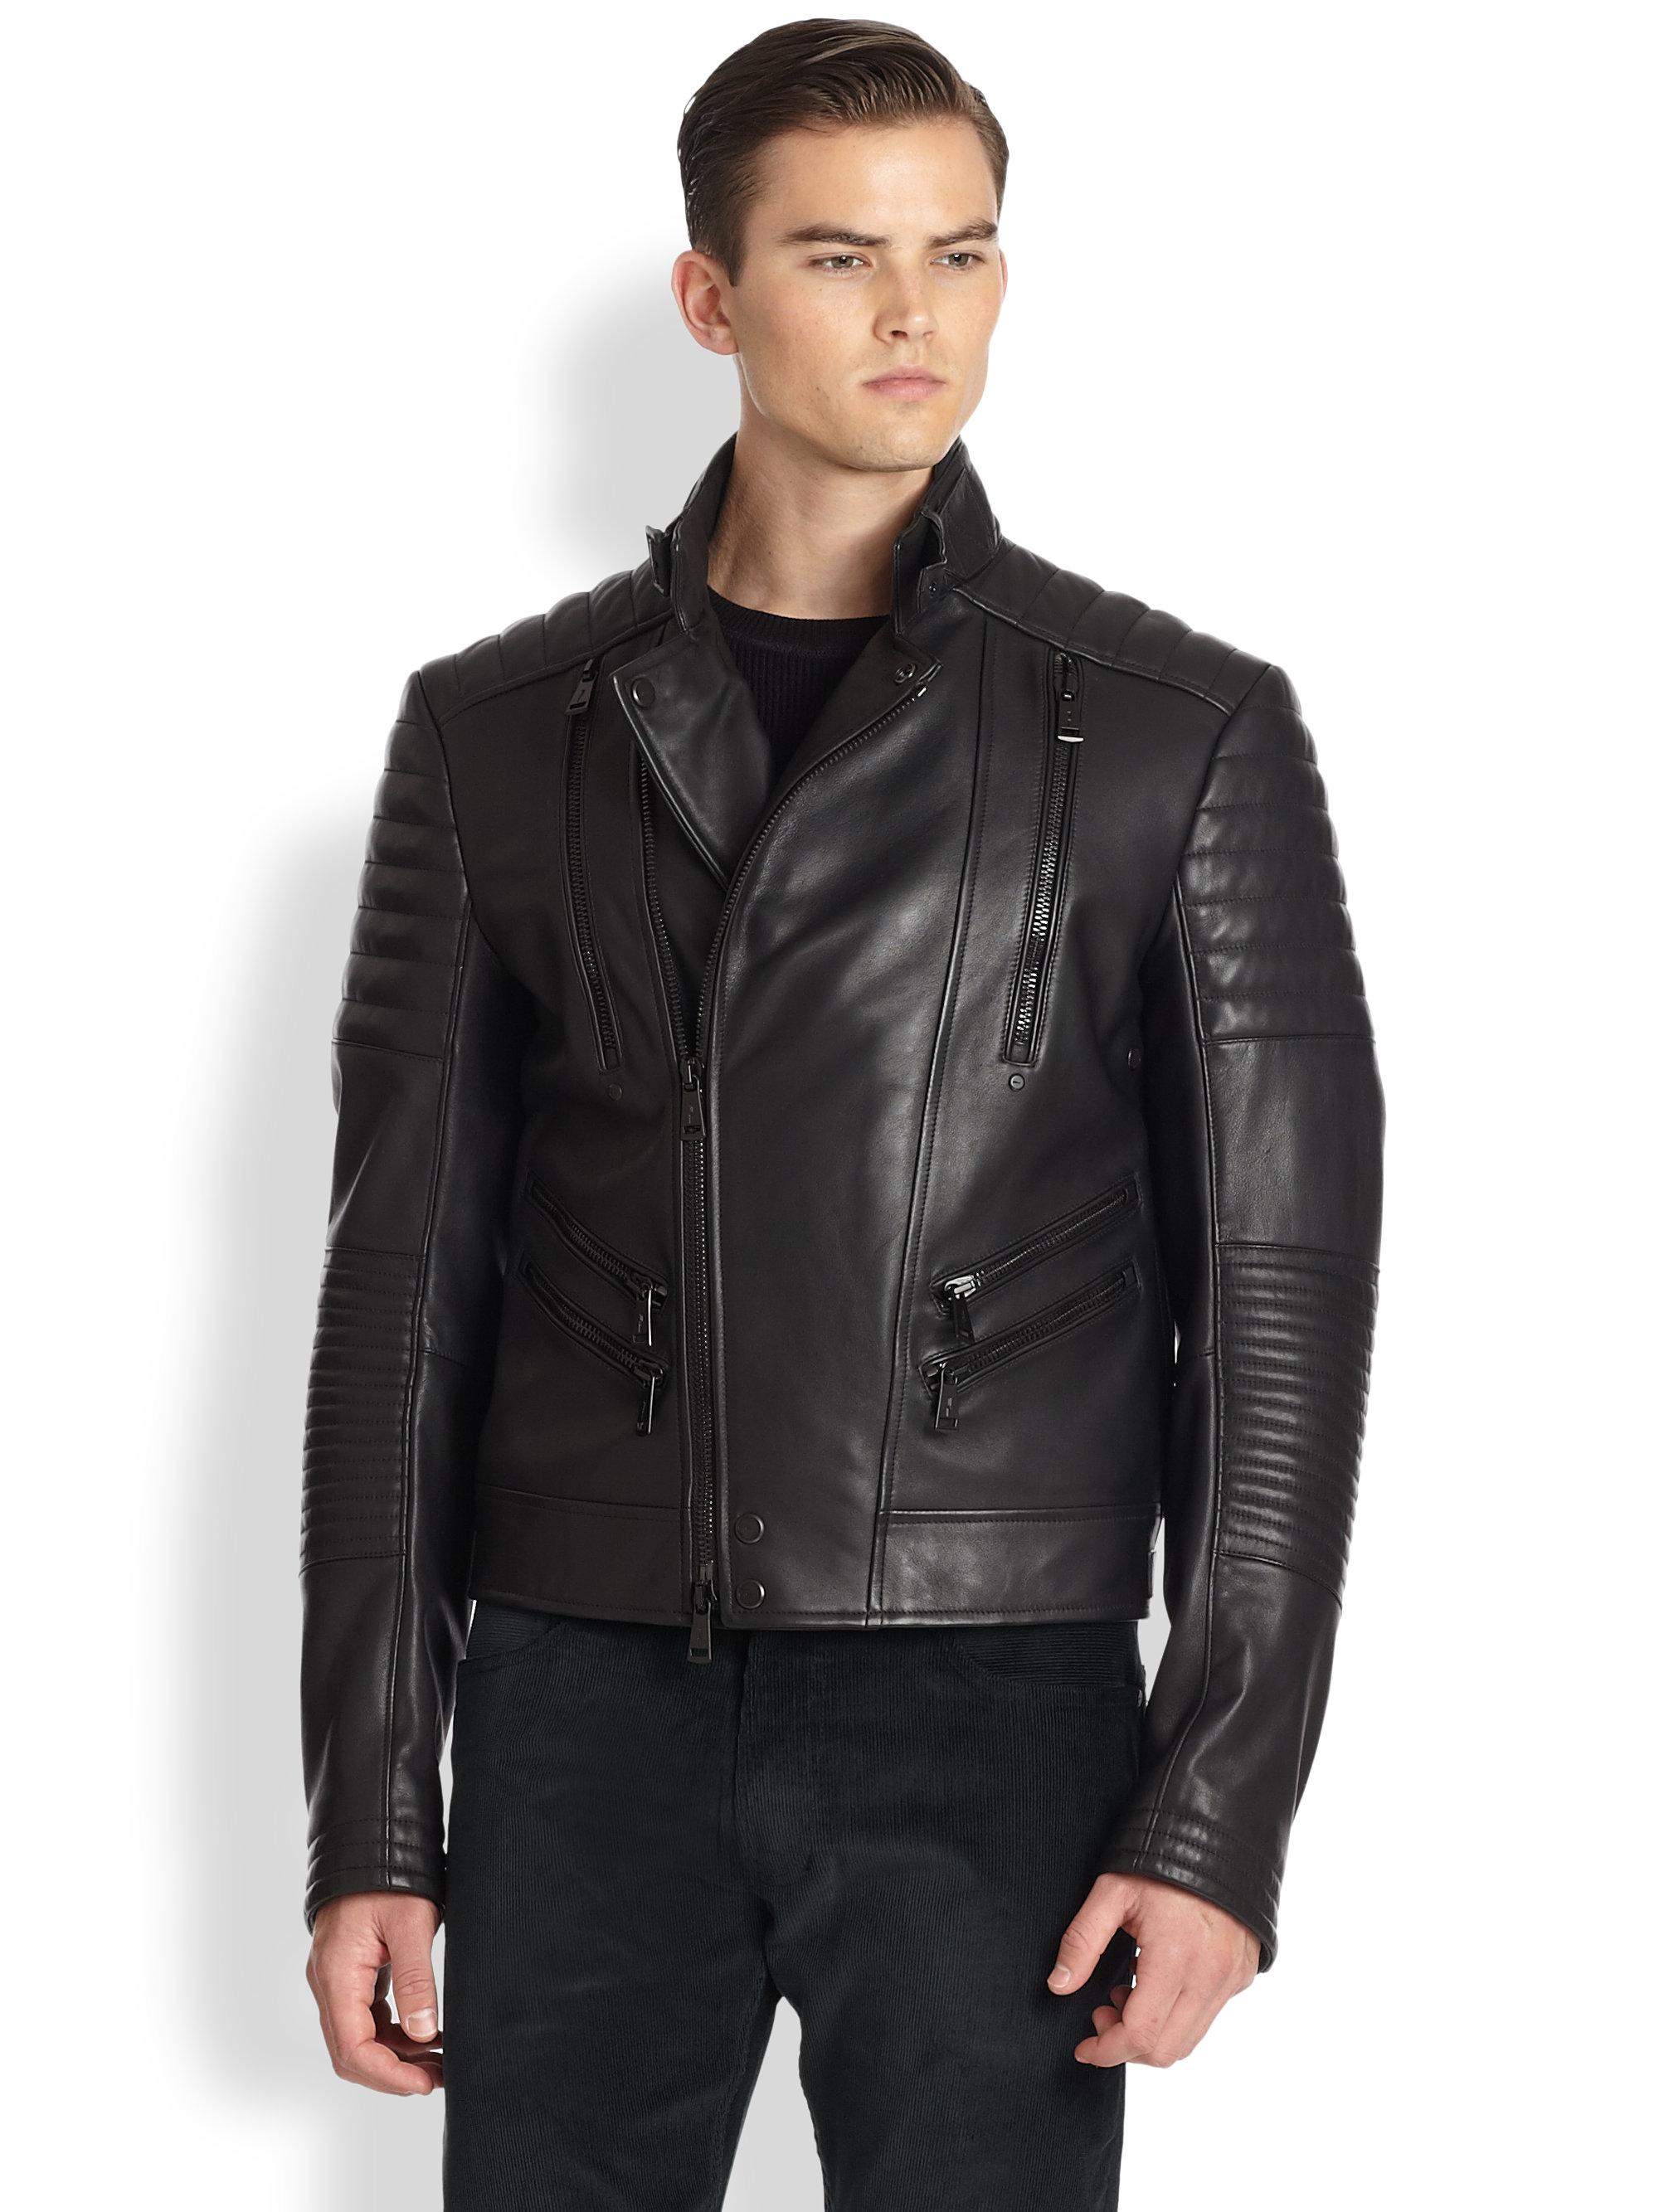 Ralph Lauren Fashion Show At New York: Ralph Lauren Black Label Quilted Zip Motorcycle